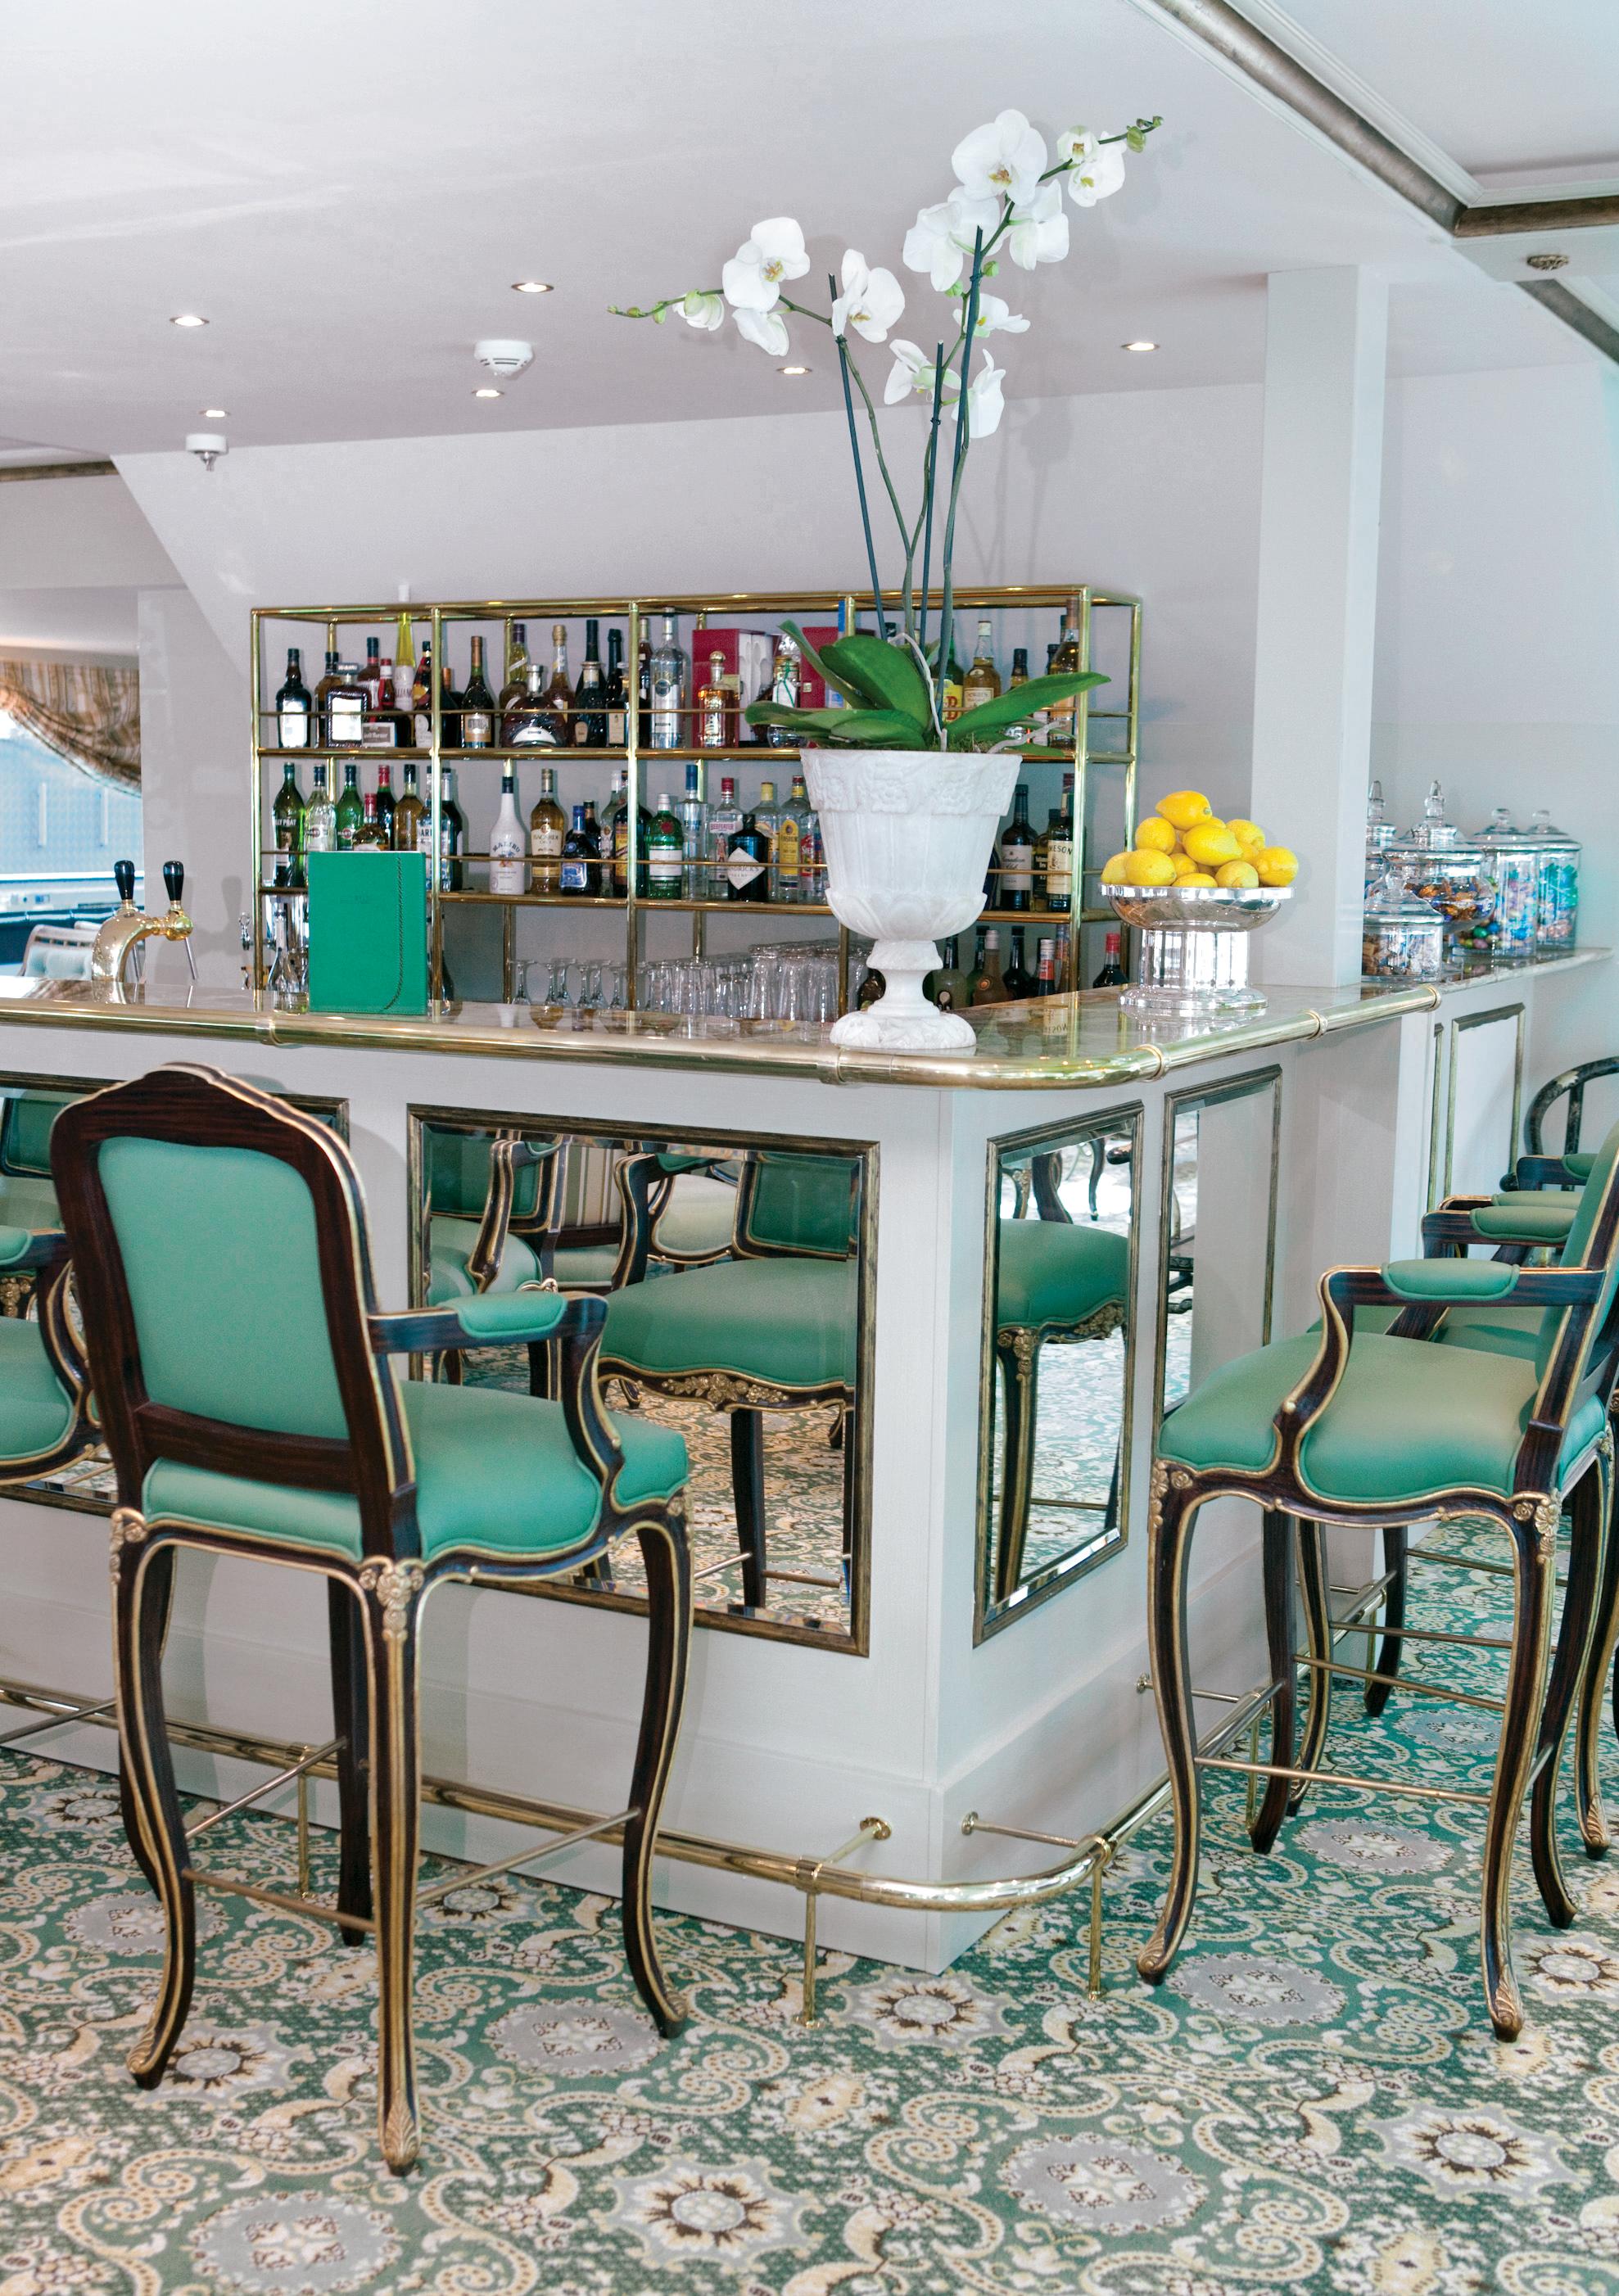 UNIWORLD Boutique River Cruises SS Antoinette Interior Salon Du Grand Trianon Bar 1.jpg